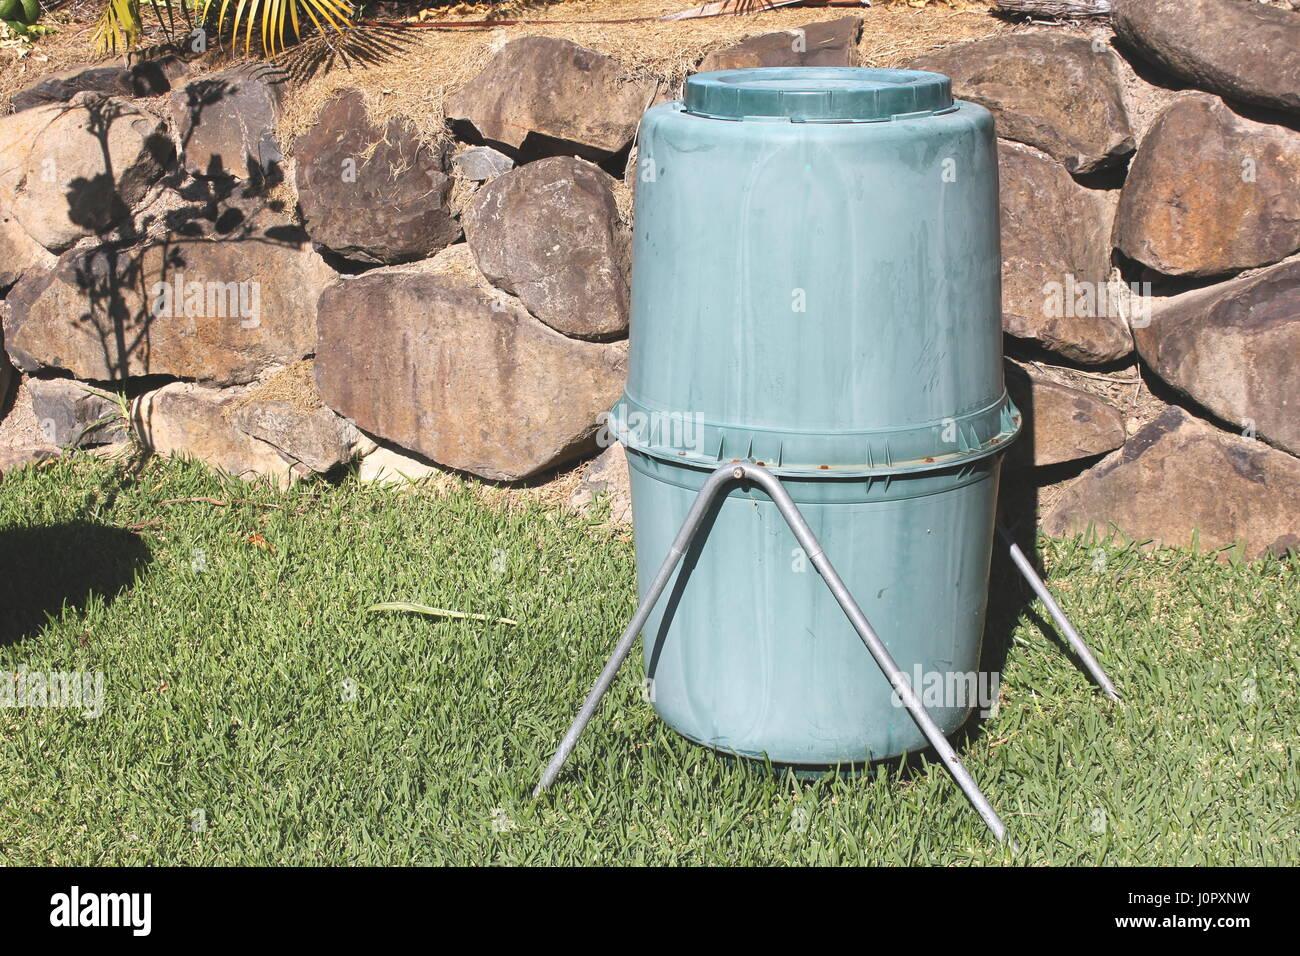 Home Compost Heap Composting Stock Photos & Home Compost Heap ...